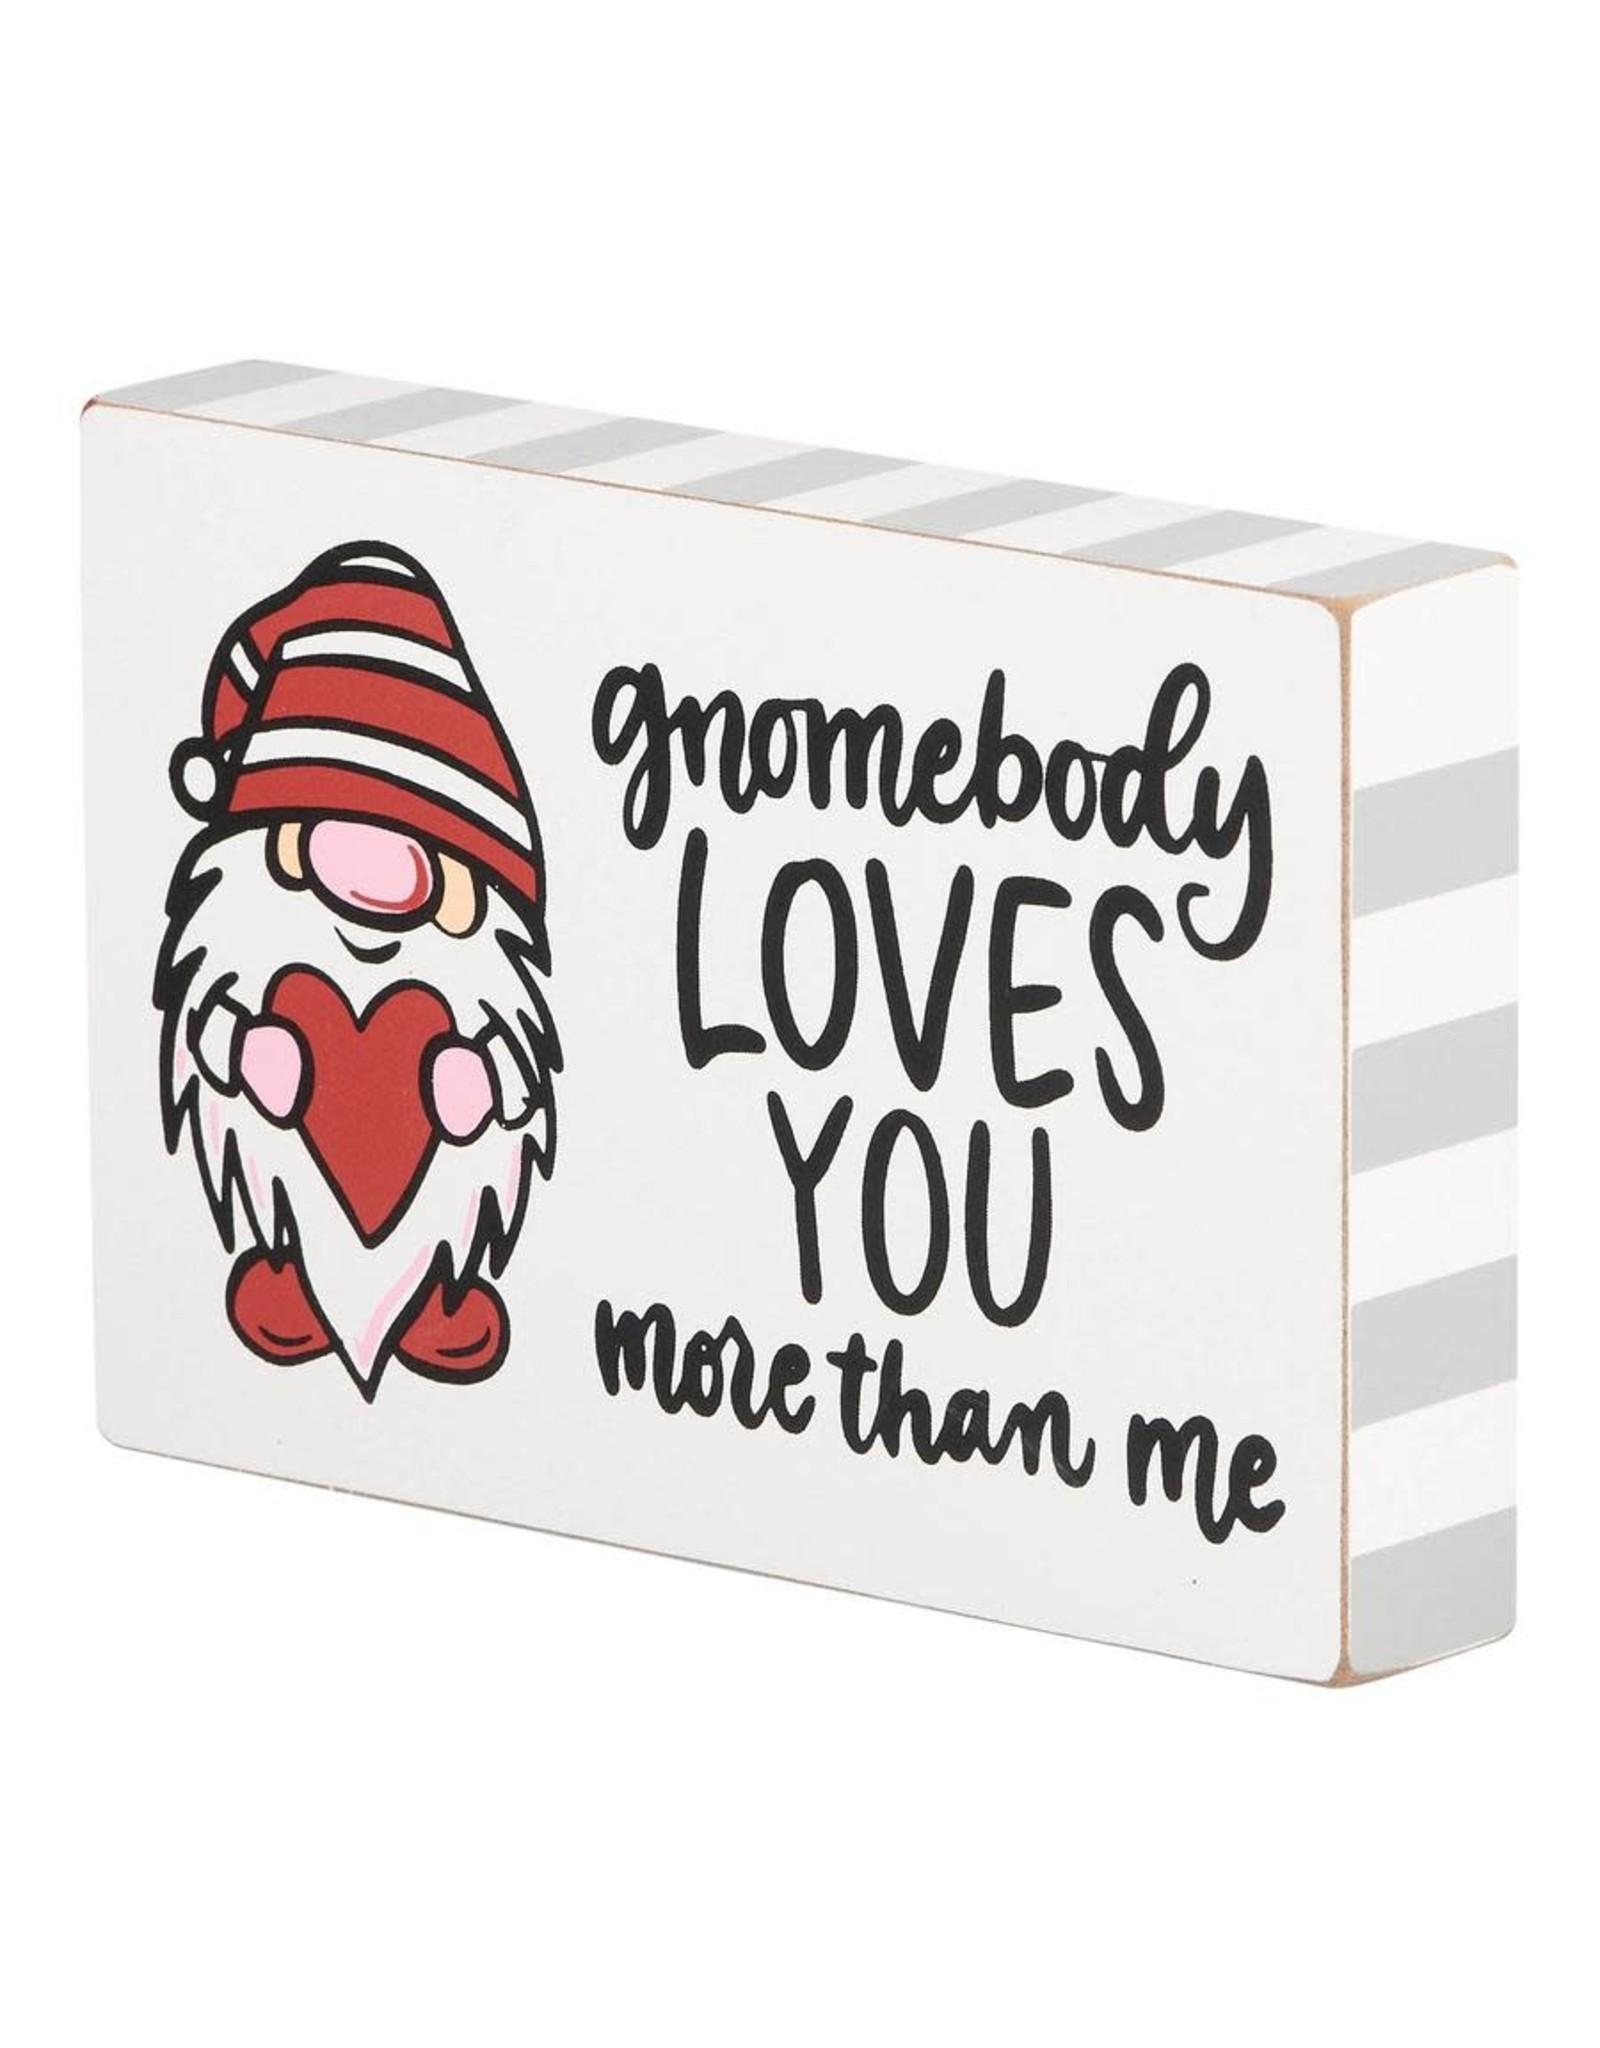 Gnomebody Loves You Block 4x6